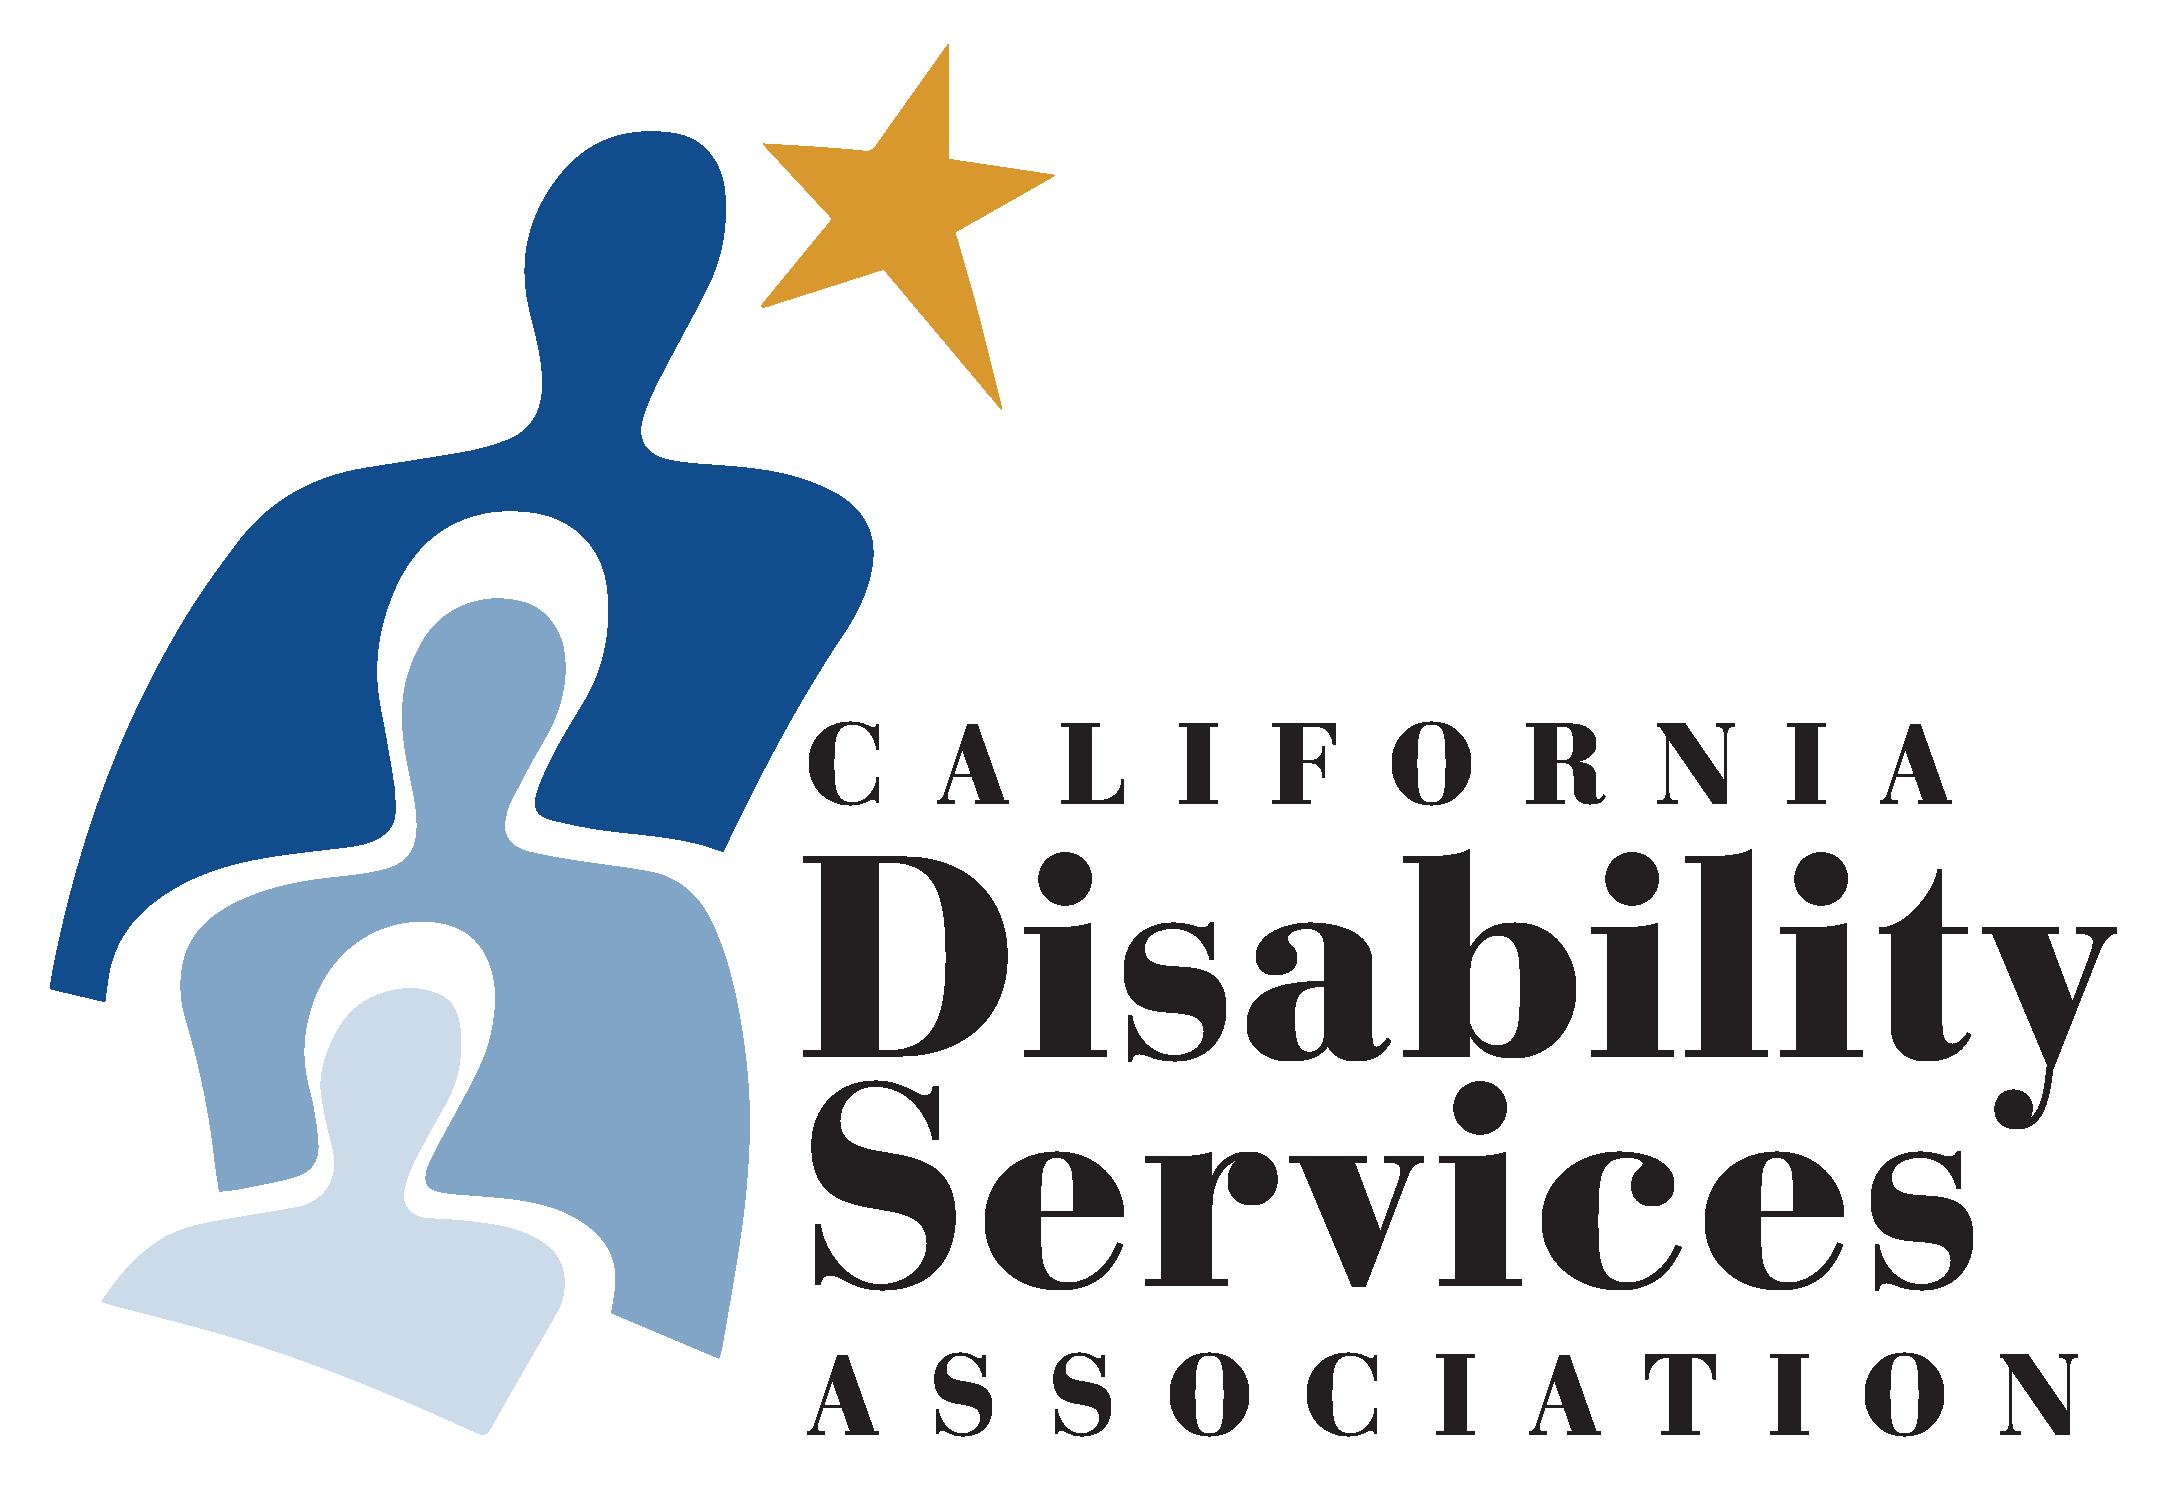 California Disability Services Association Logo.